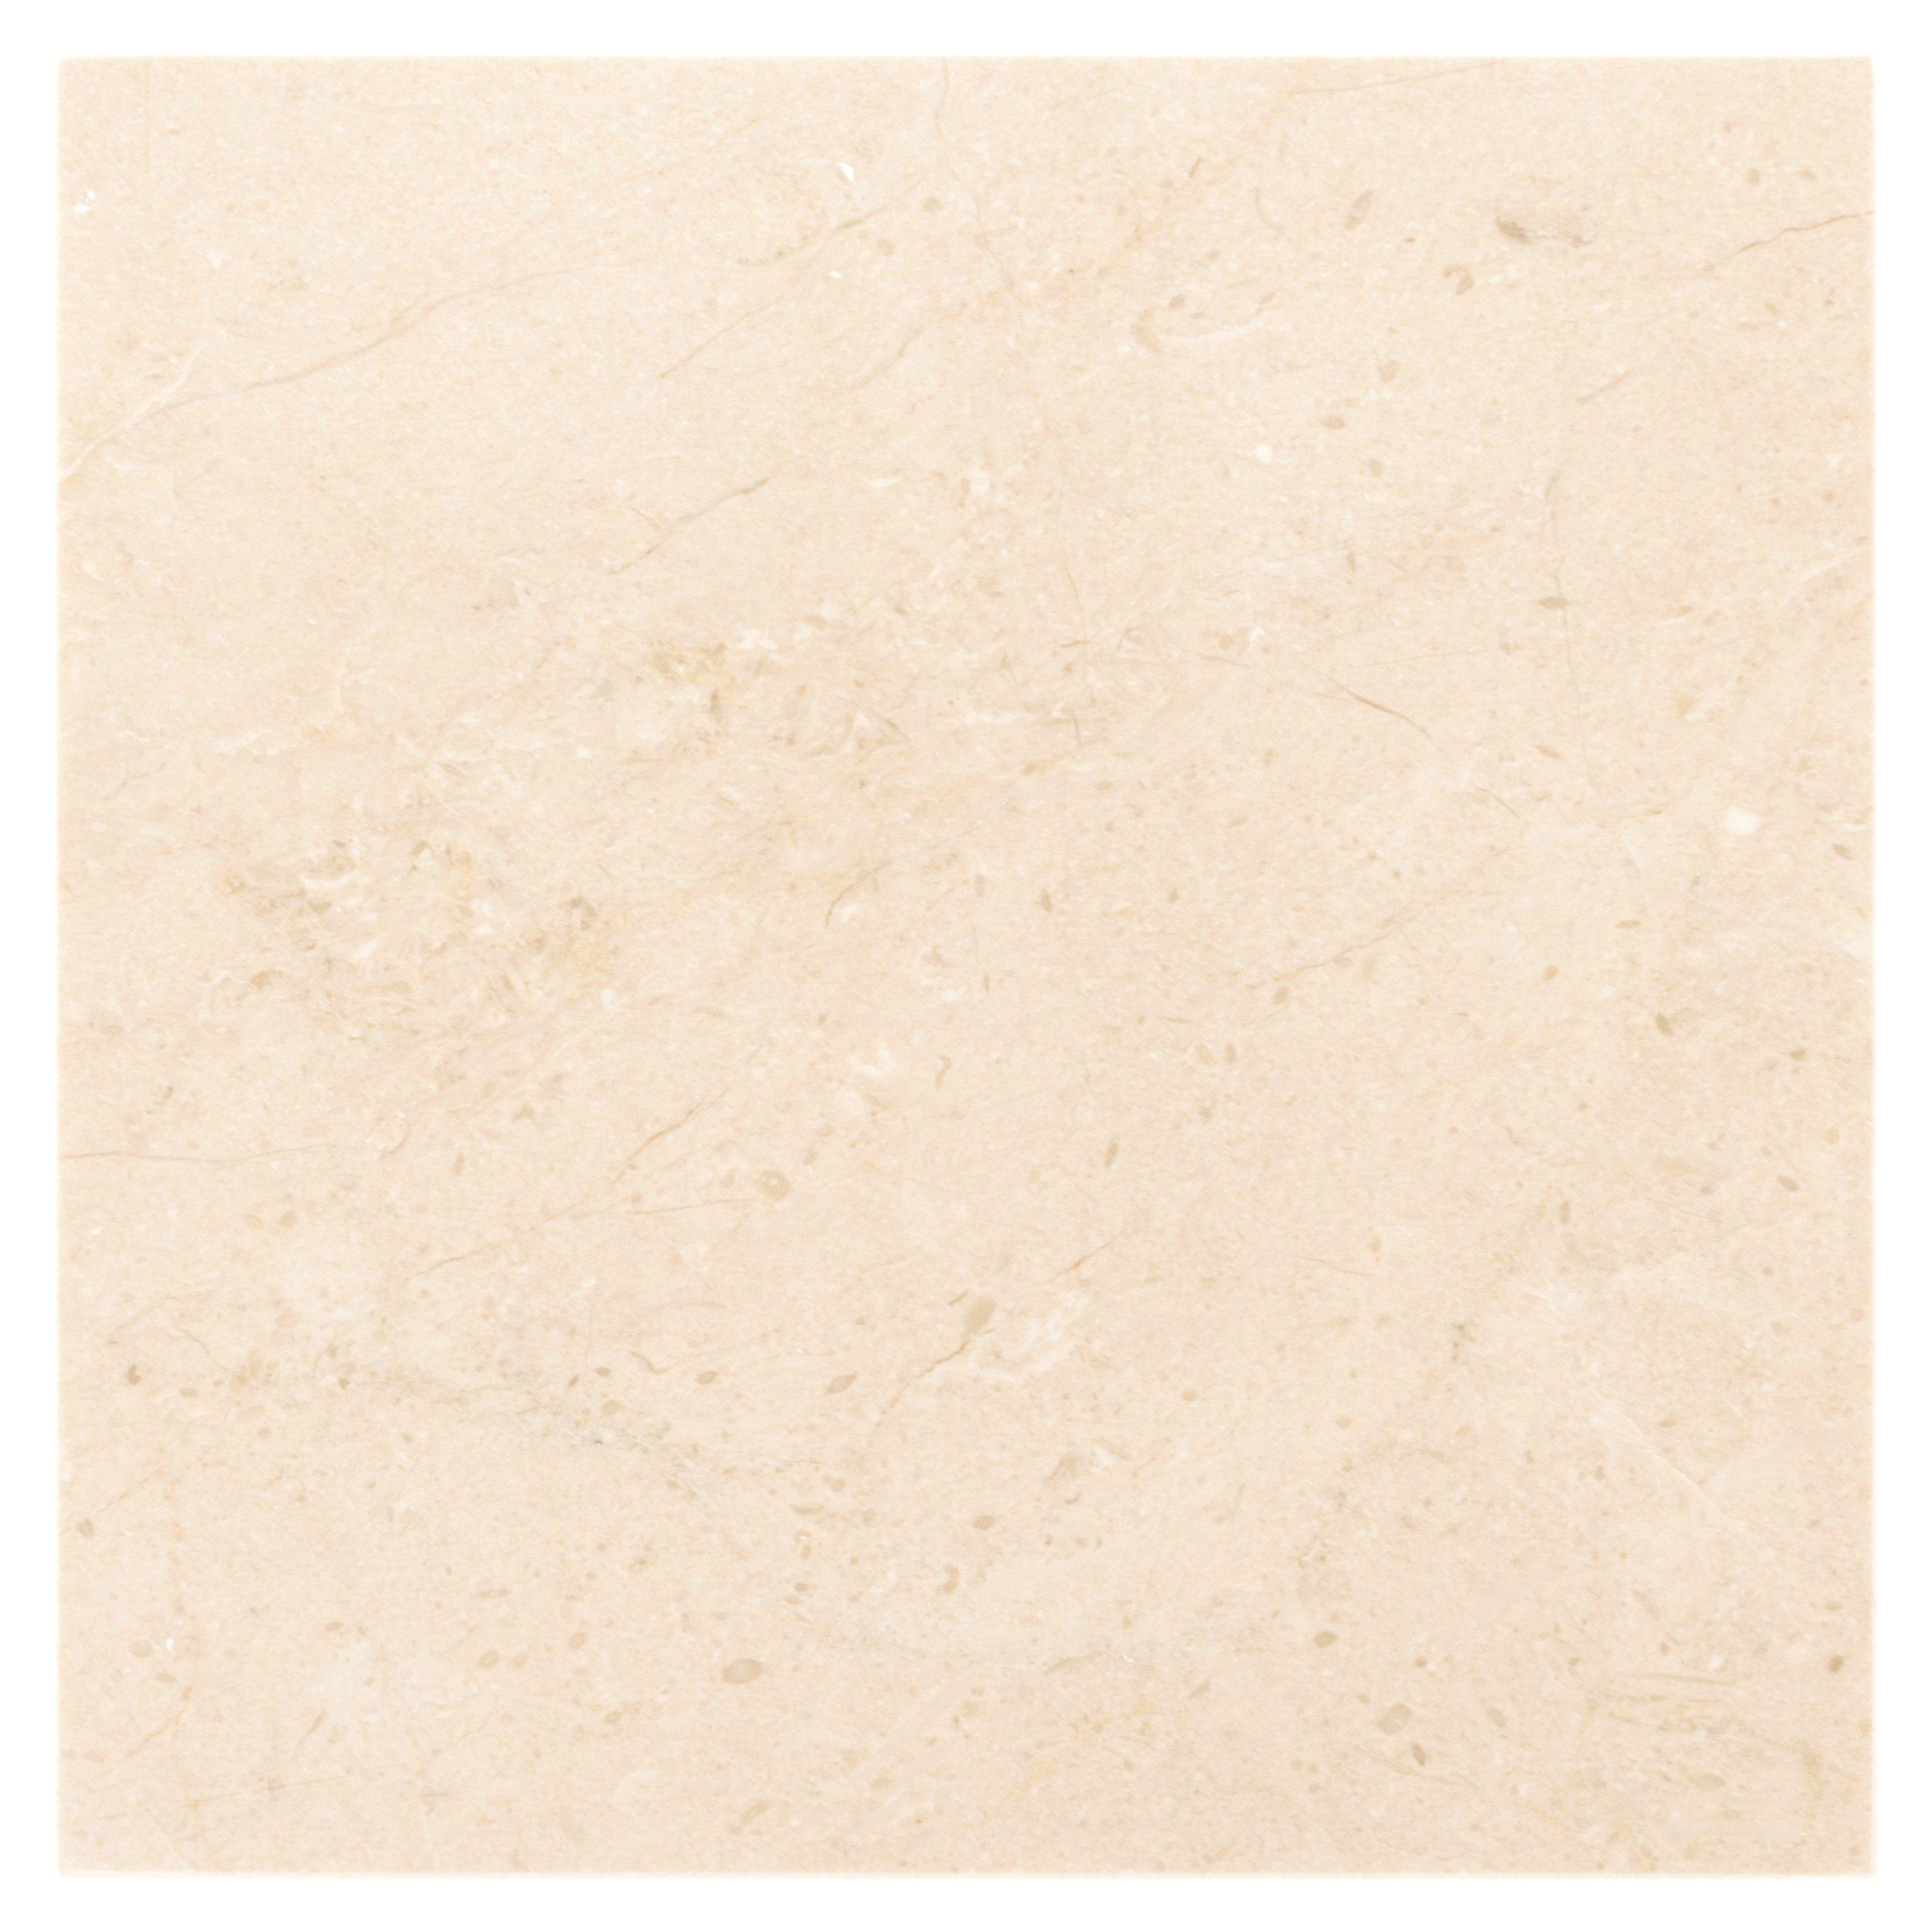 Crema Marfil Porcelain Tile: Crema Marfil Classic Marble Tile